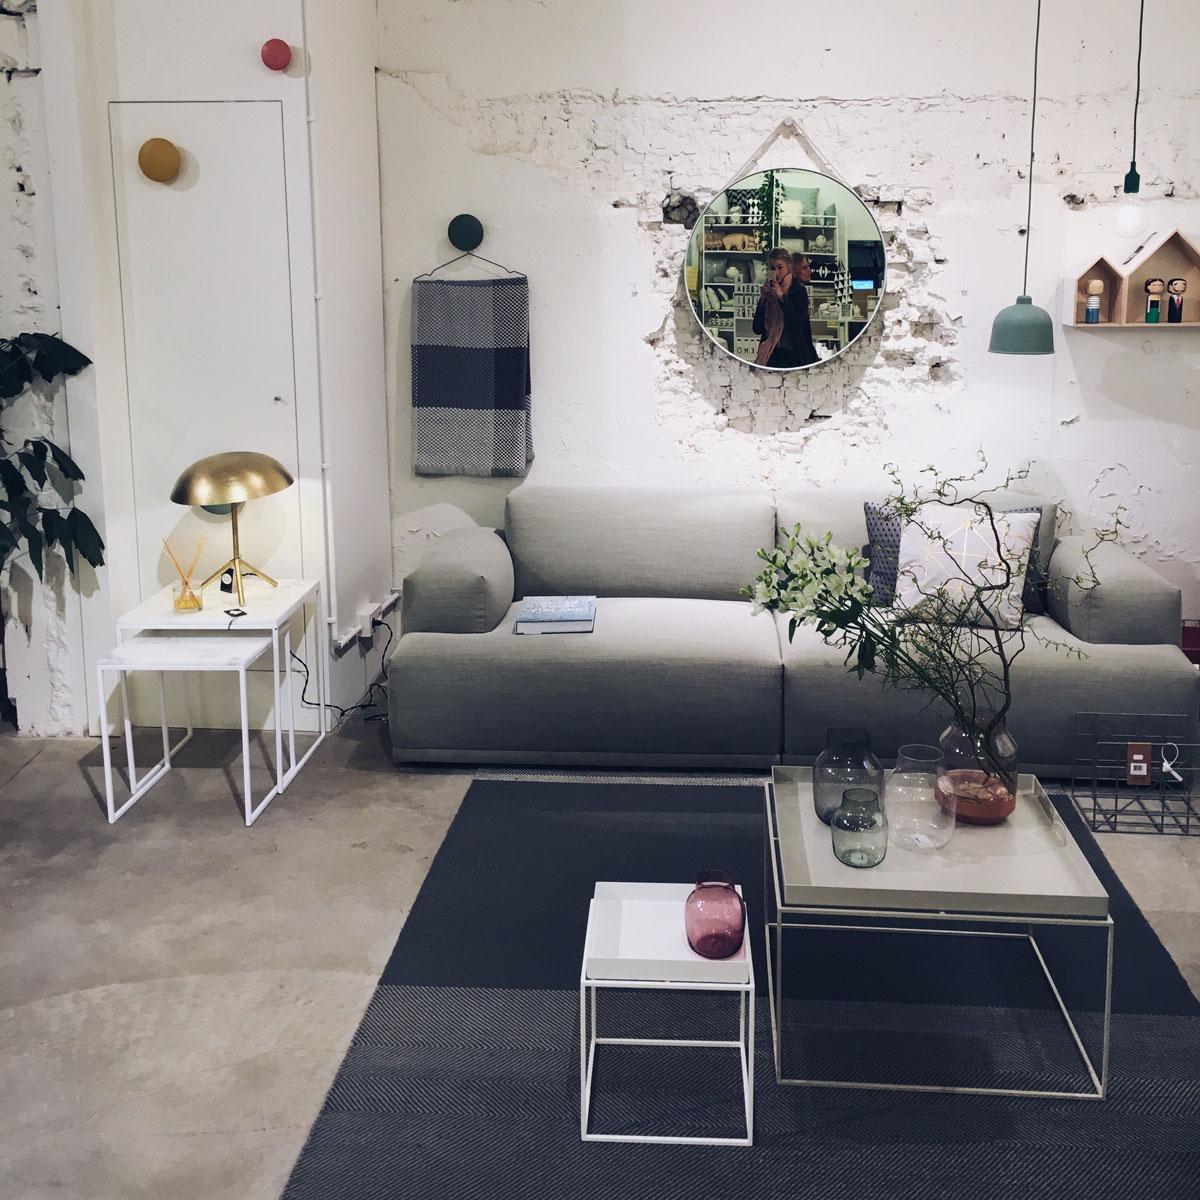 home design und deko shopping erfahrung great lden with. Black Bedroom Furniture Sets. Home Design Ideas